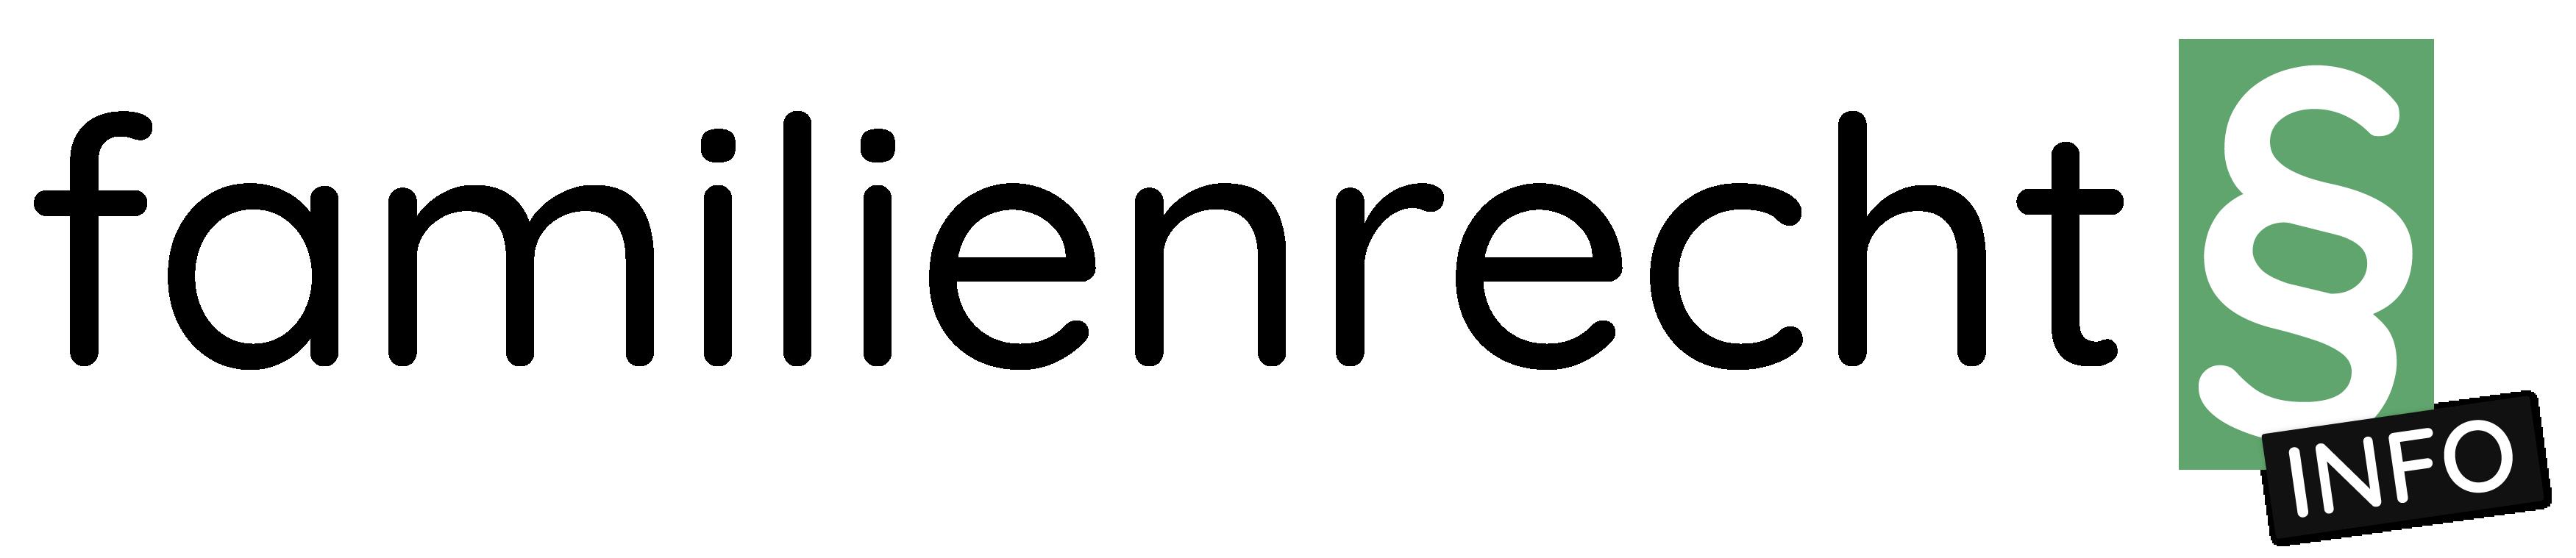 Familienrechtsinfo-Logo-retina.png